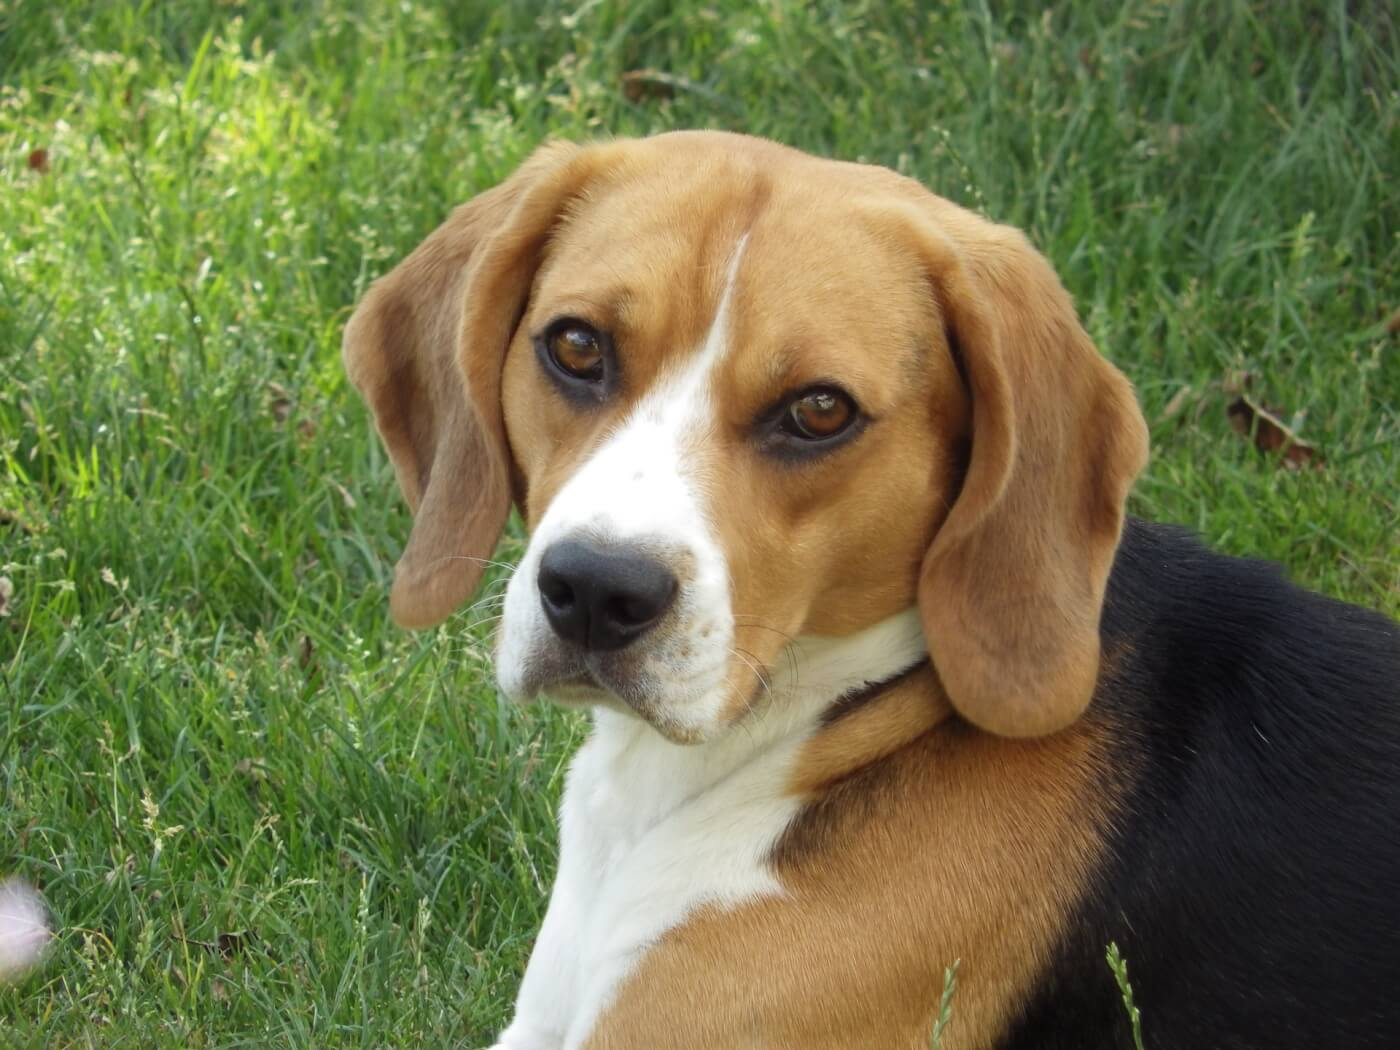 2019 Brazil Pesticide Poisoning Tests on Dogs